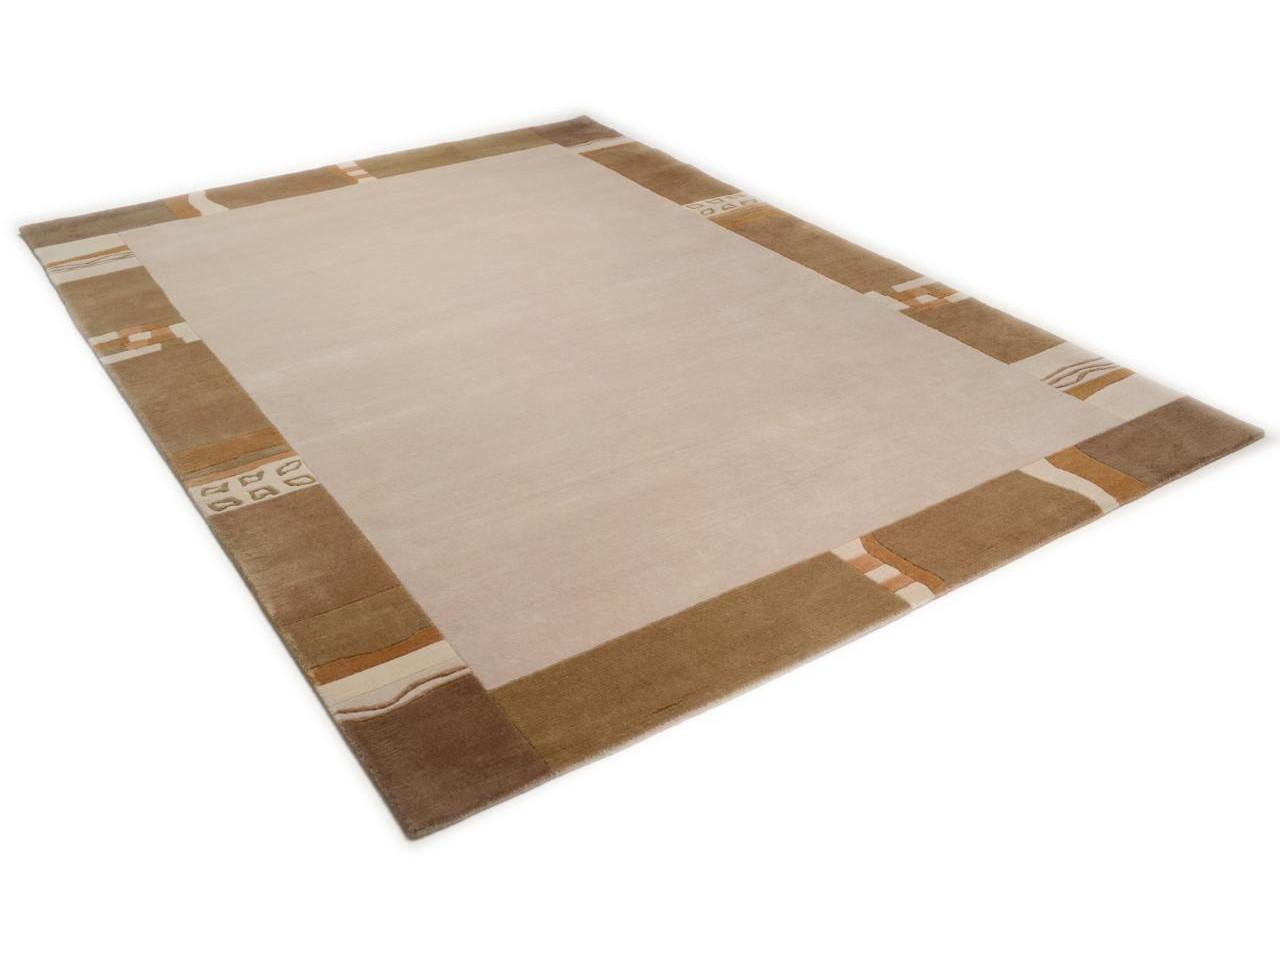 avantis sable tapis bordures n 1881 140x70cm. Black Bedroom Furniture Sets. Home Design Ideas